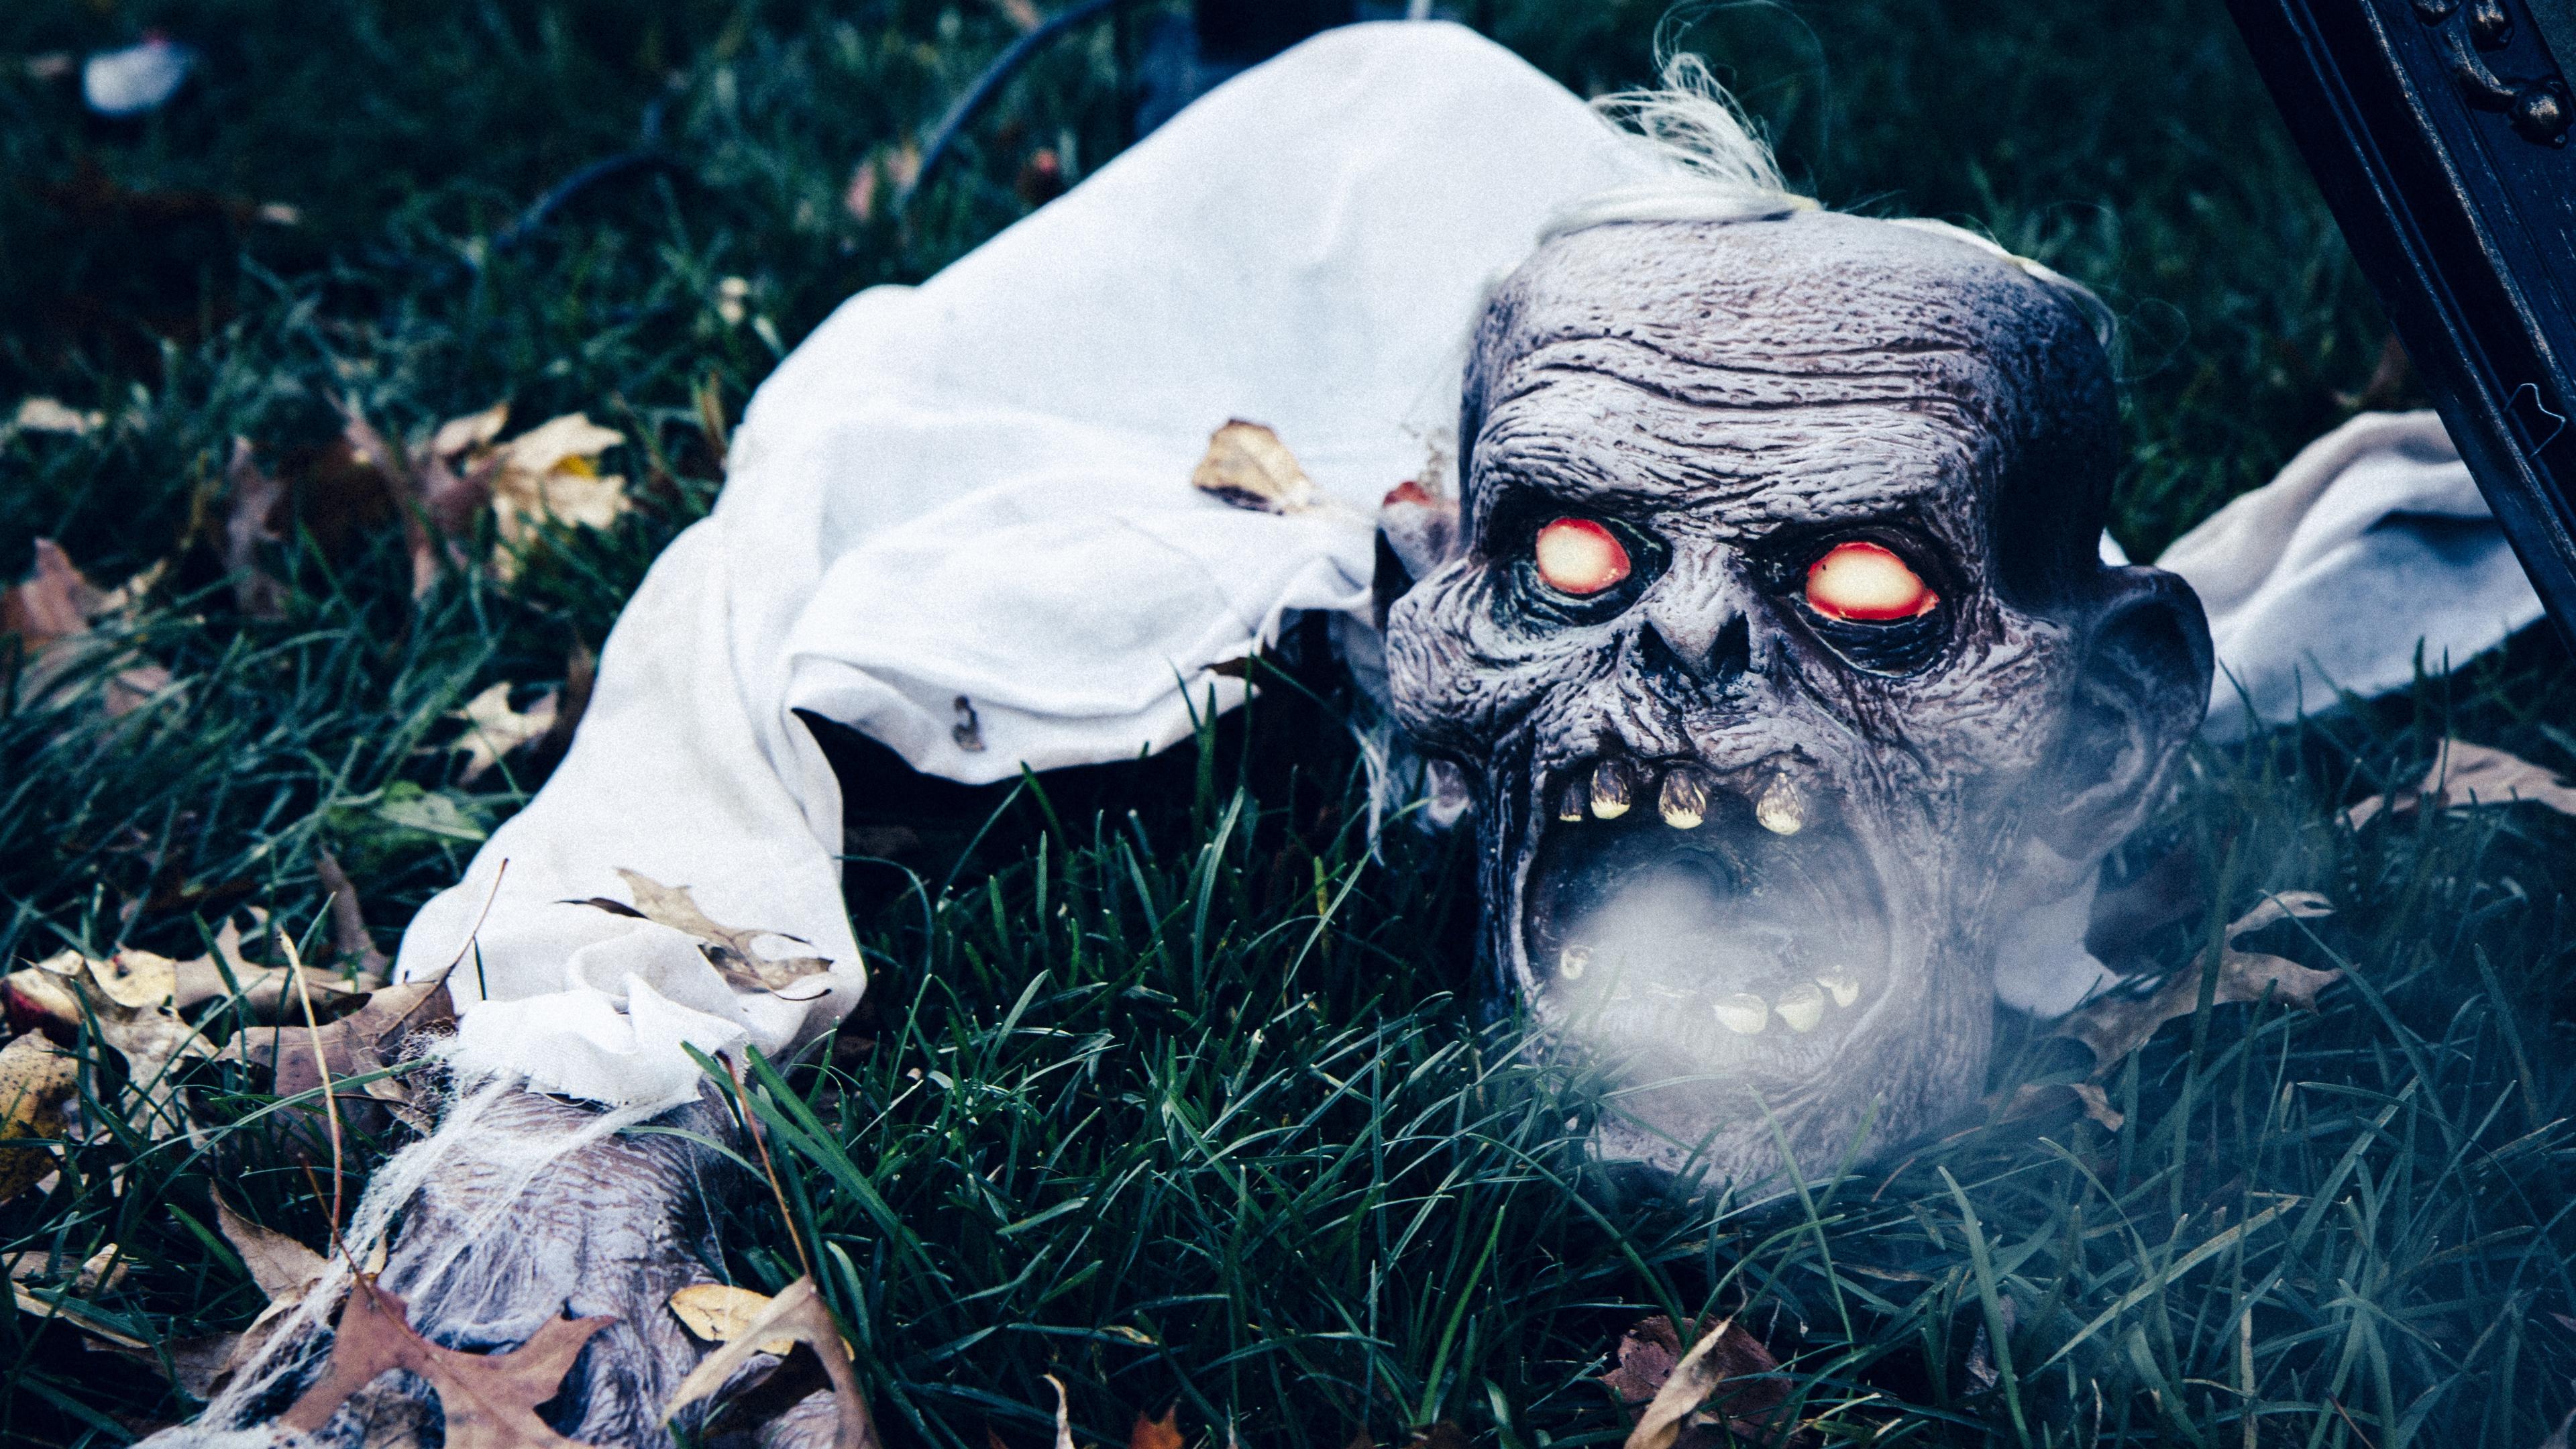 halloween mask scary grass 4k 1538344742 - halloween, mask, scary, grass 4k - Scary, Mask, halloween